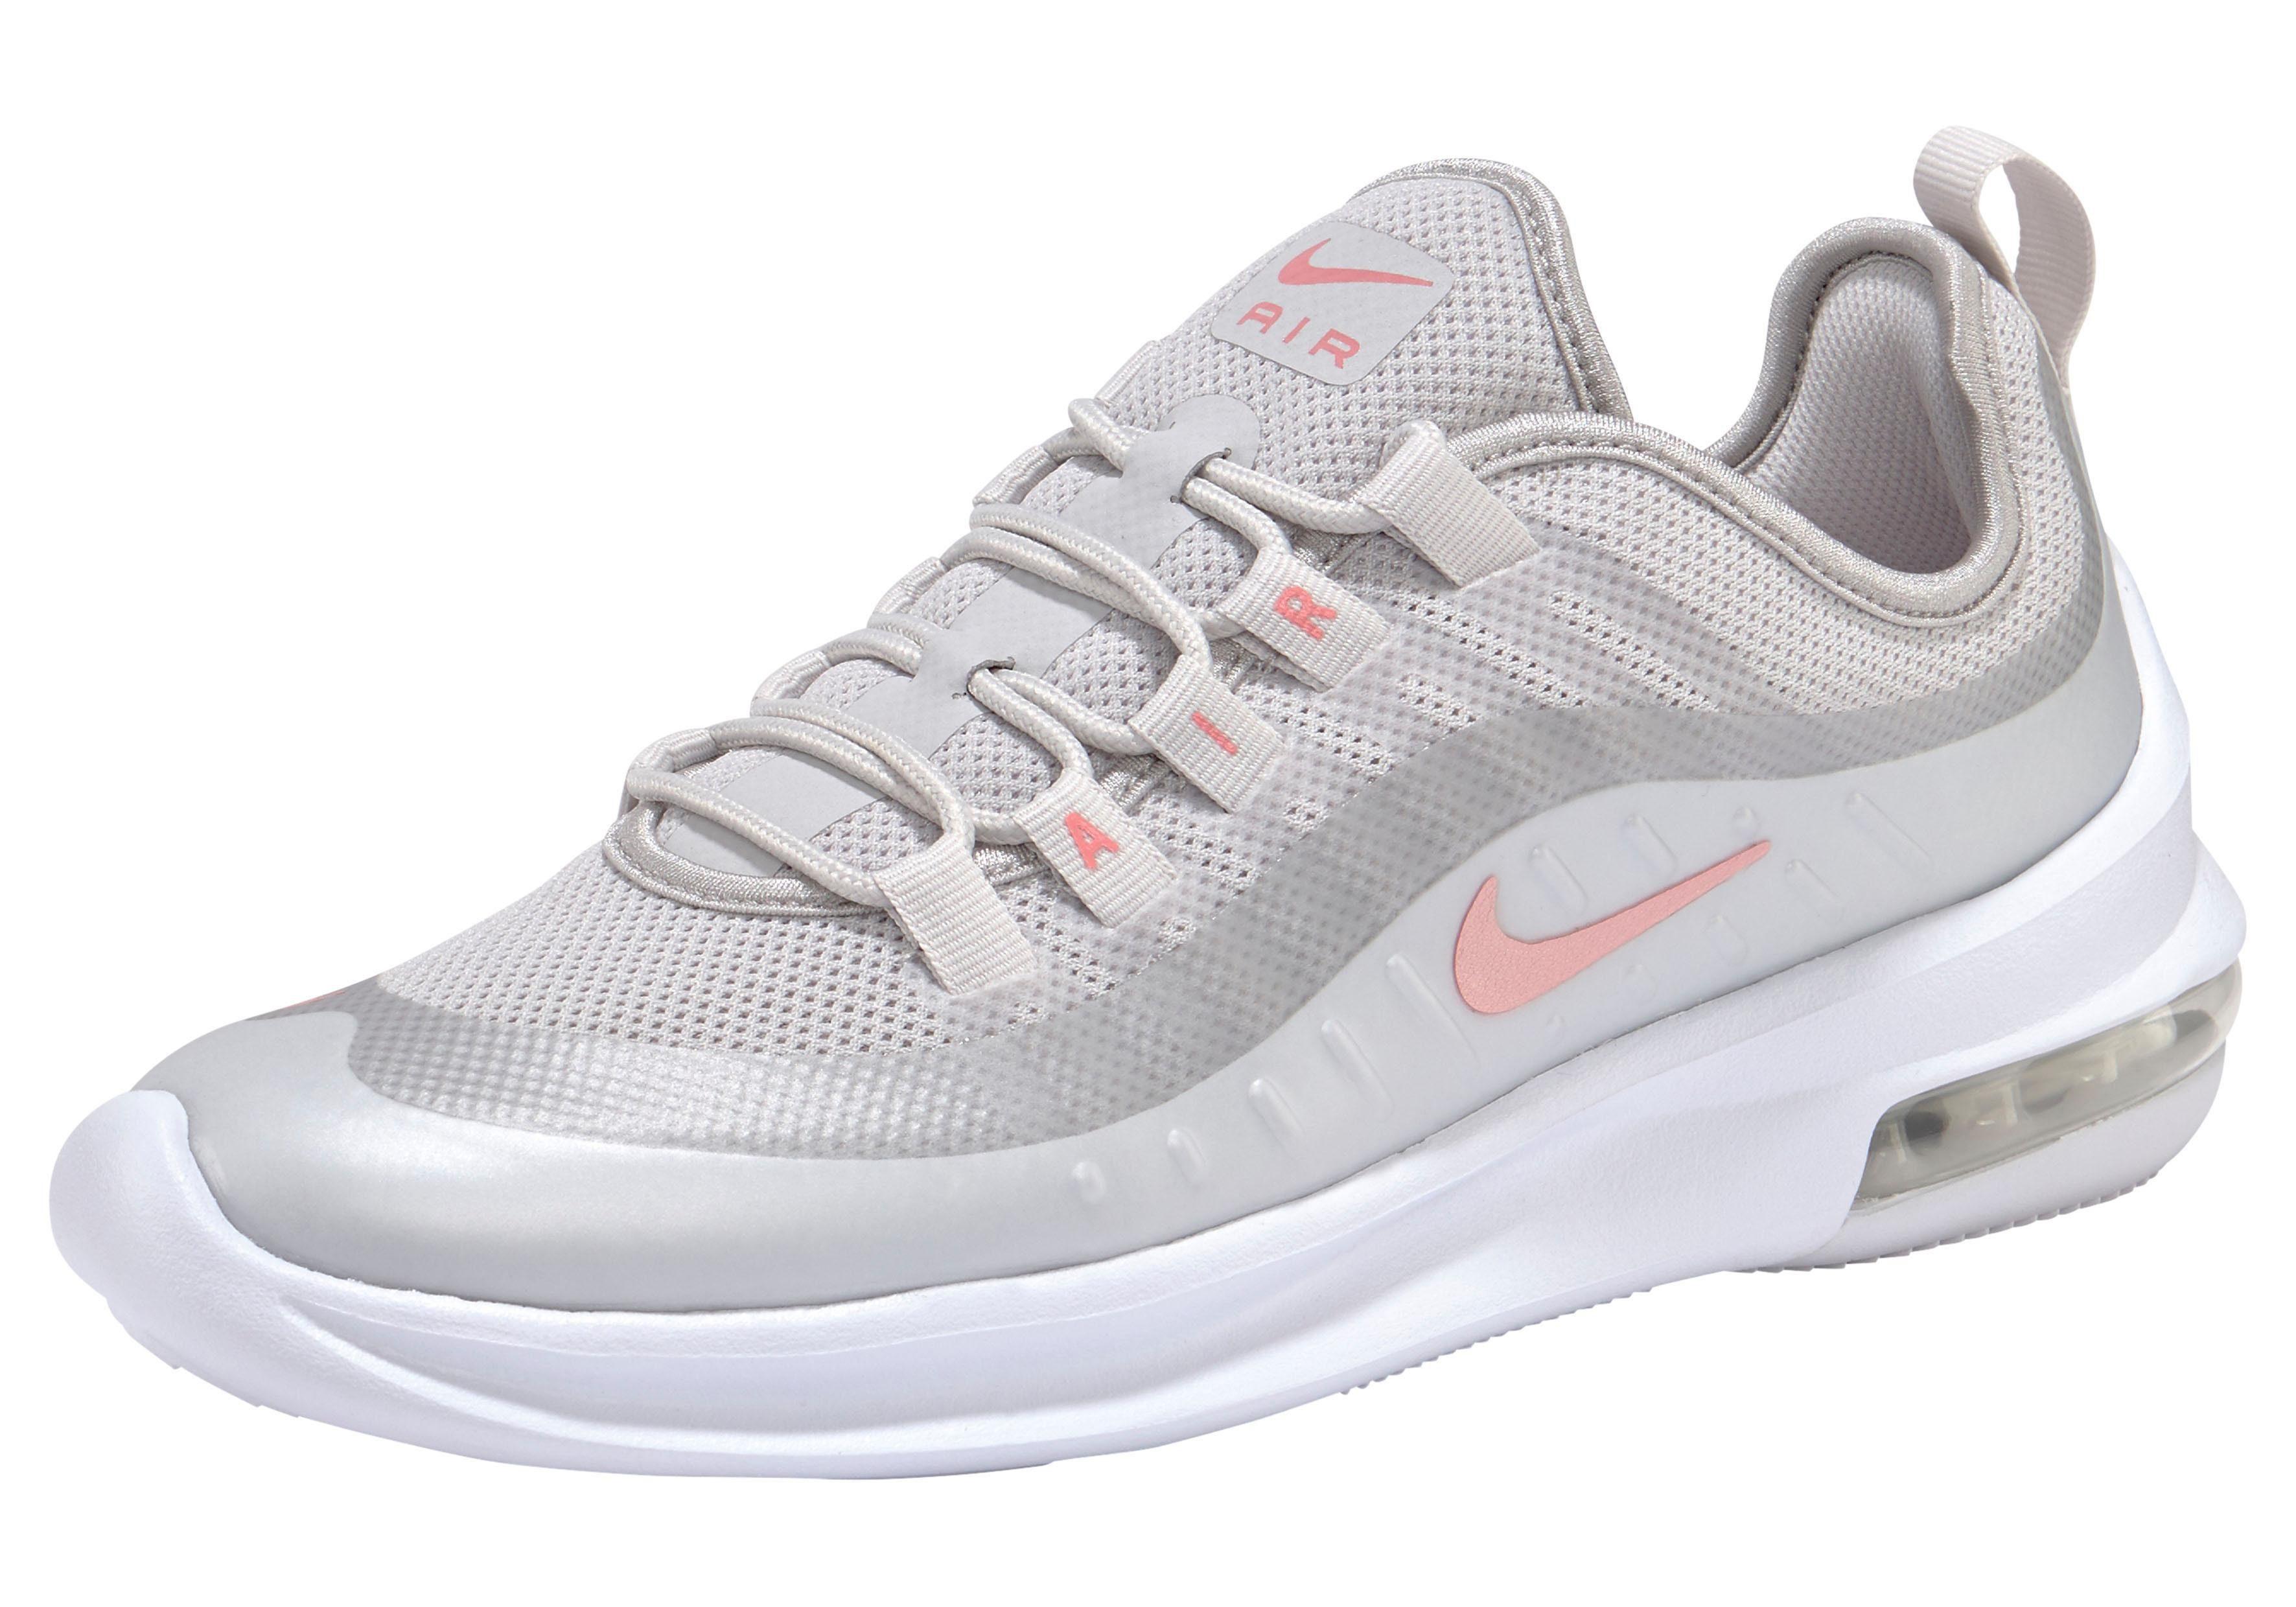 nike wmns air max command schuhe sneaker weiß pink